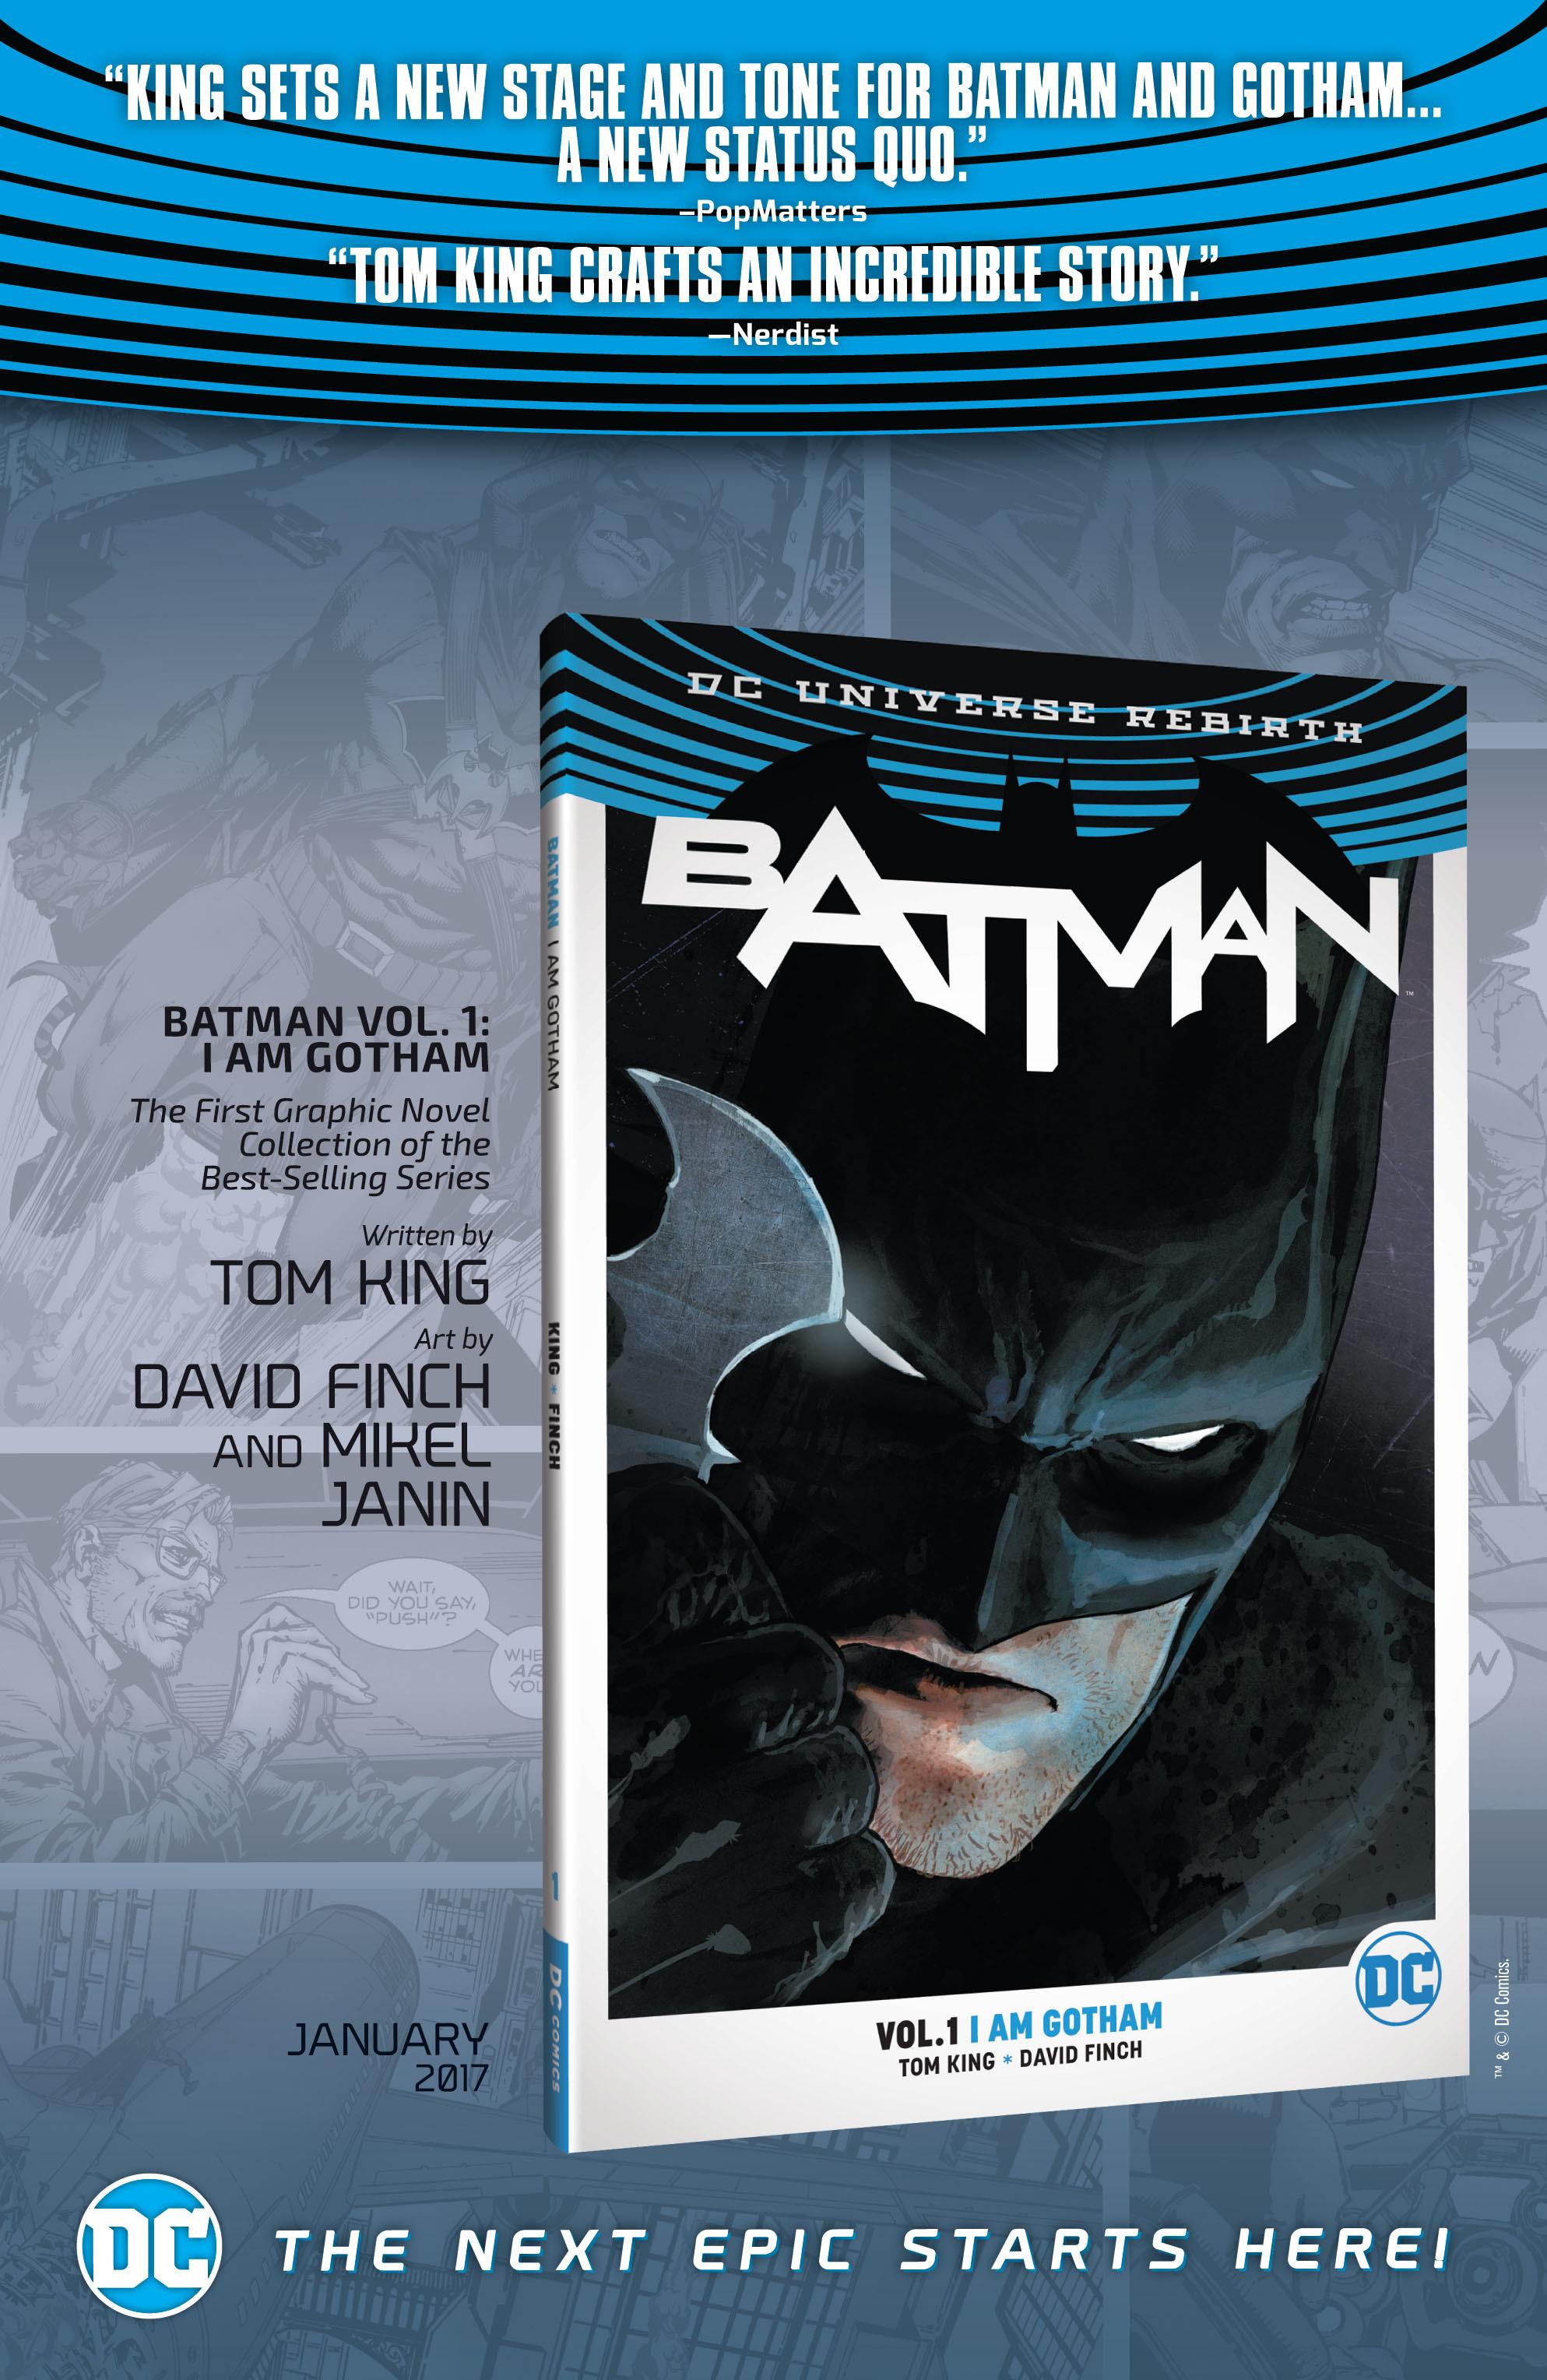 Read online All-Star Batman comic -  Issue #4 - 2